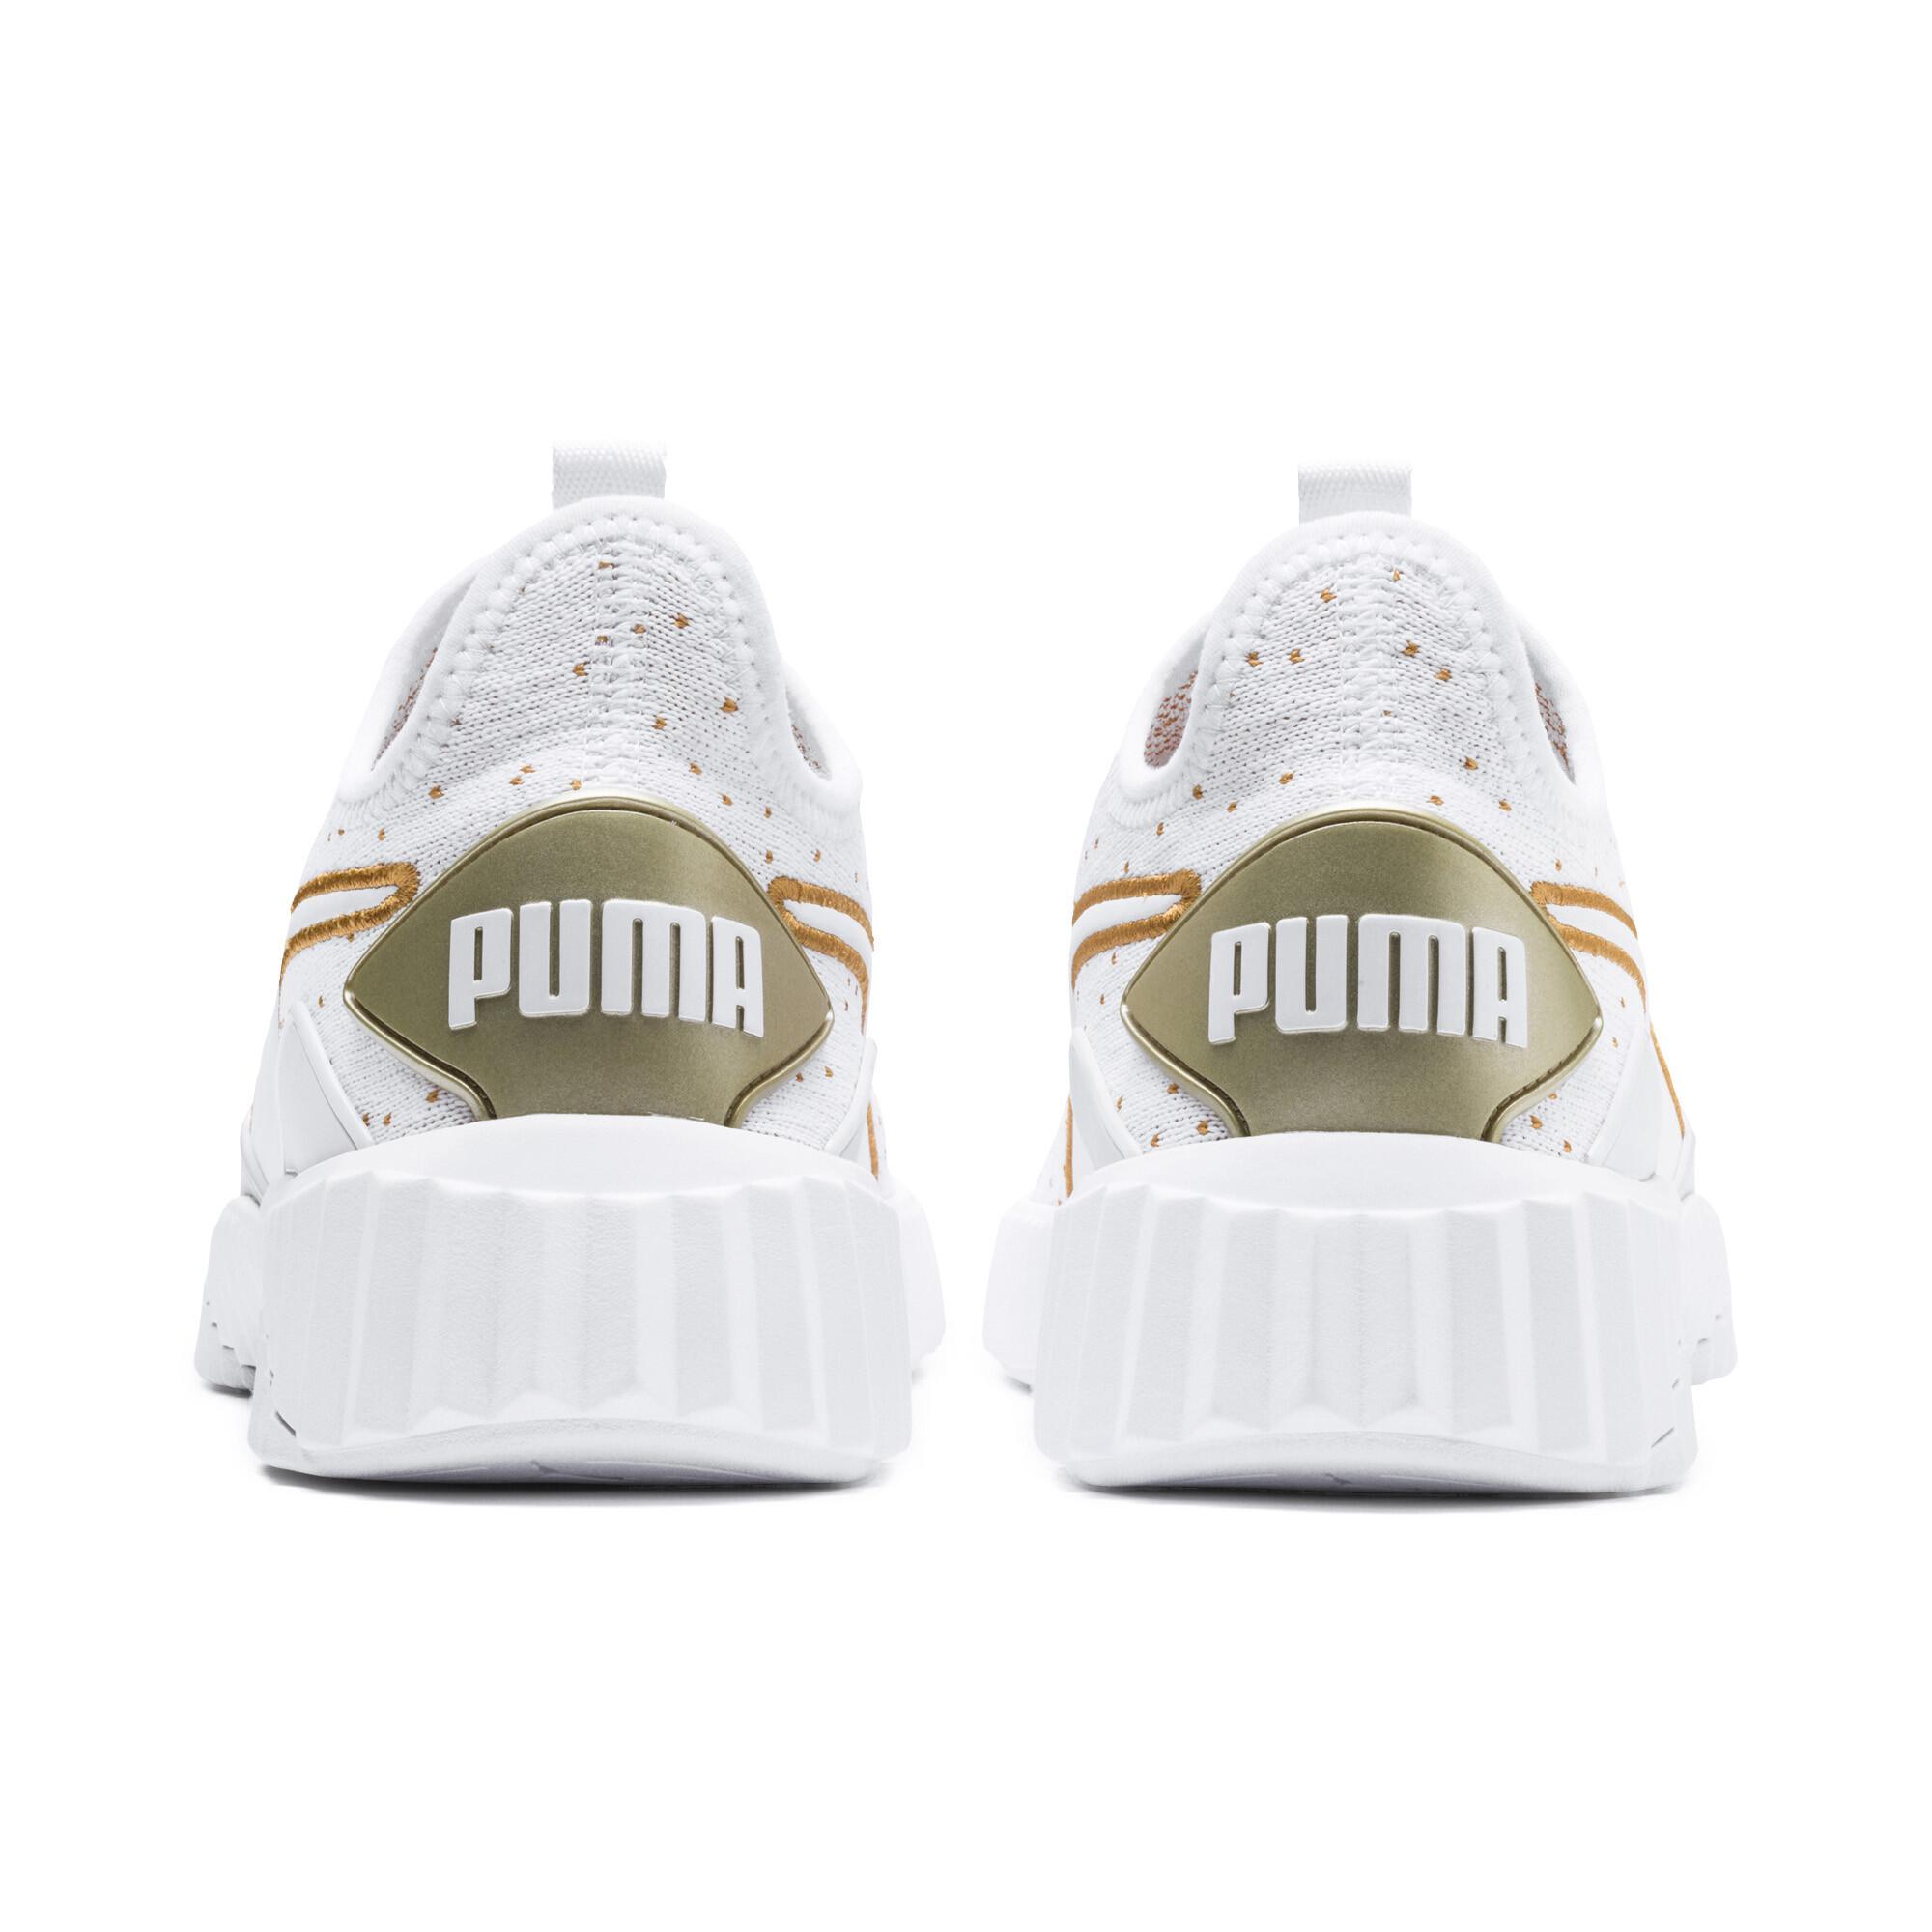 PUMA-Defy-Speckle-Women-s-Training-Shoes-Women-Shoe-Training thumbnail 3